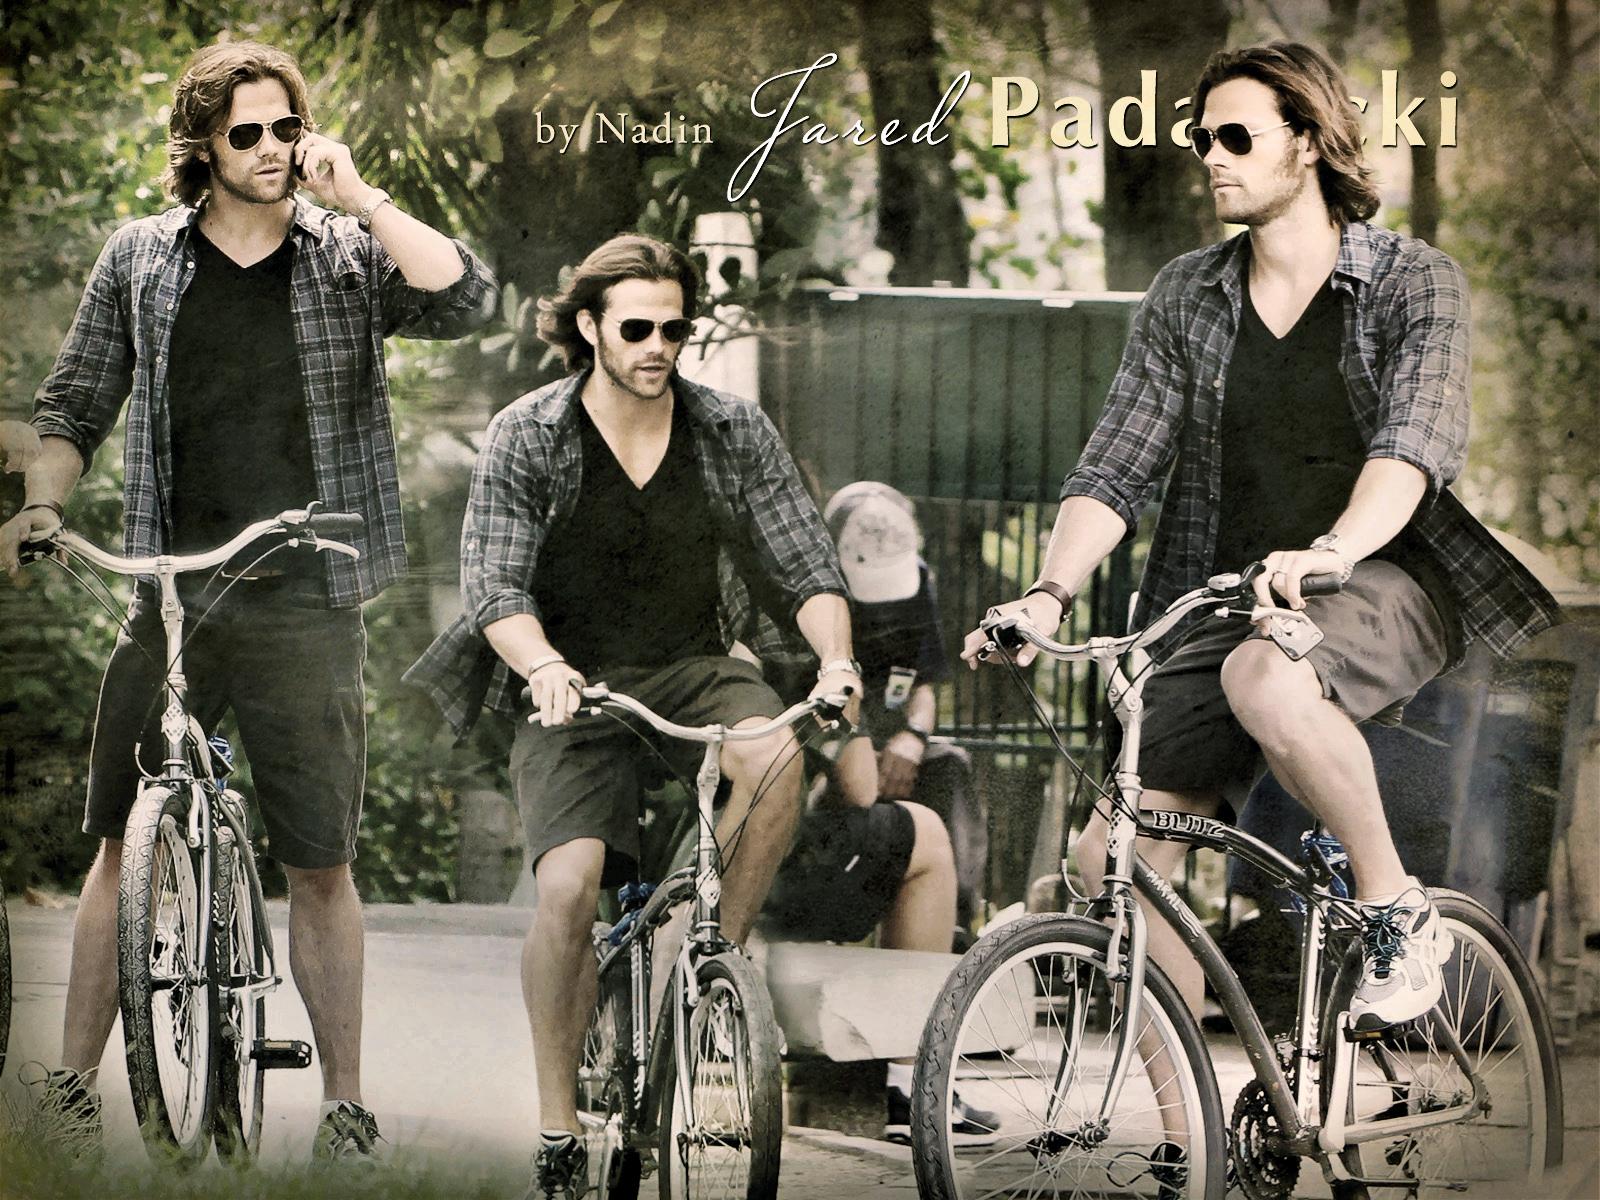 598281258_Jared_on_bike_Nadin_122_590lo.jpg